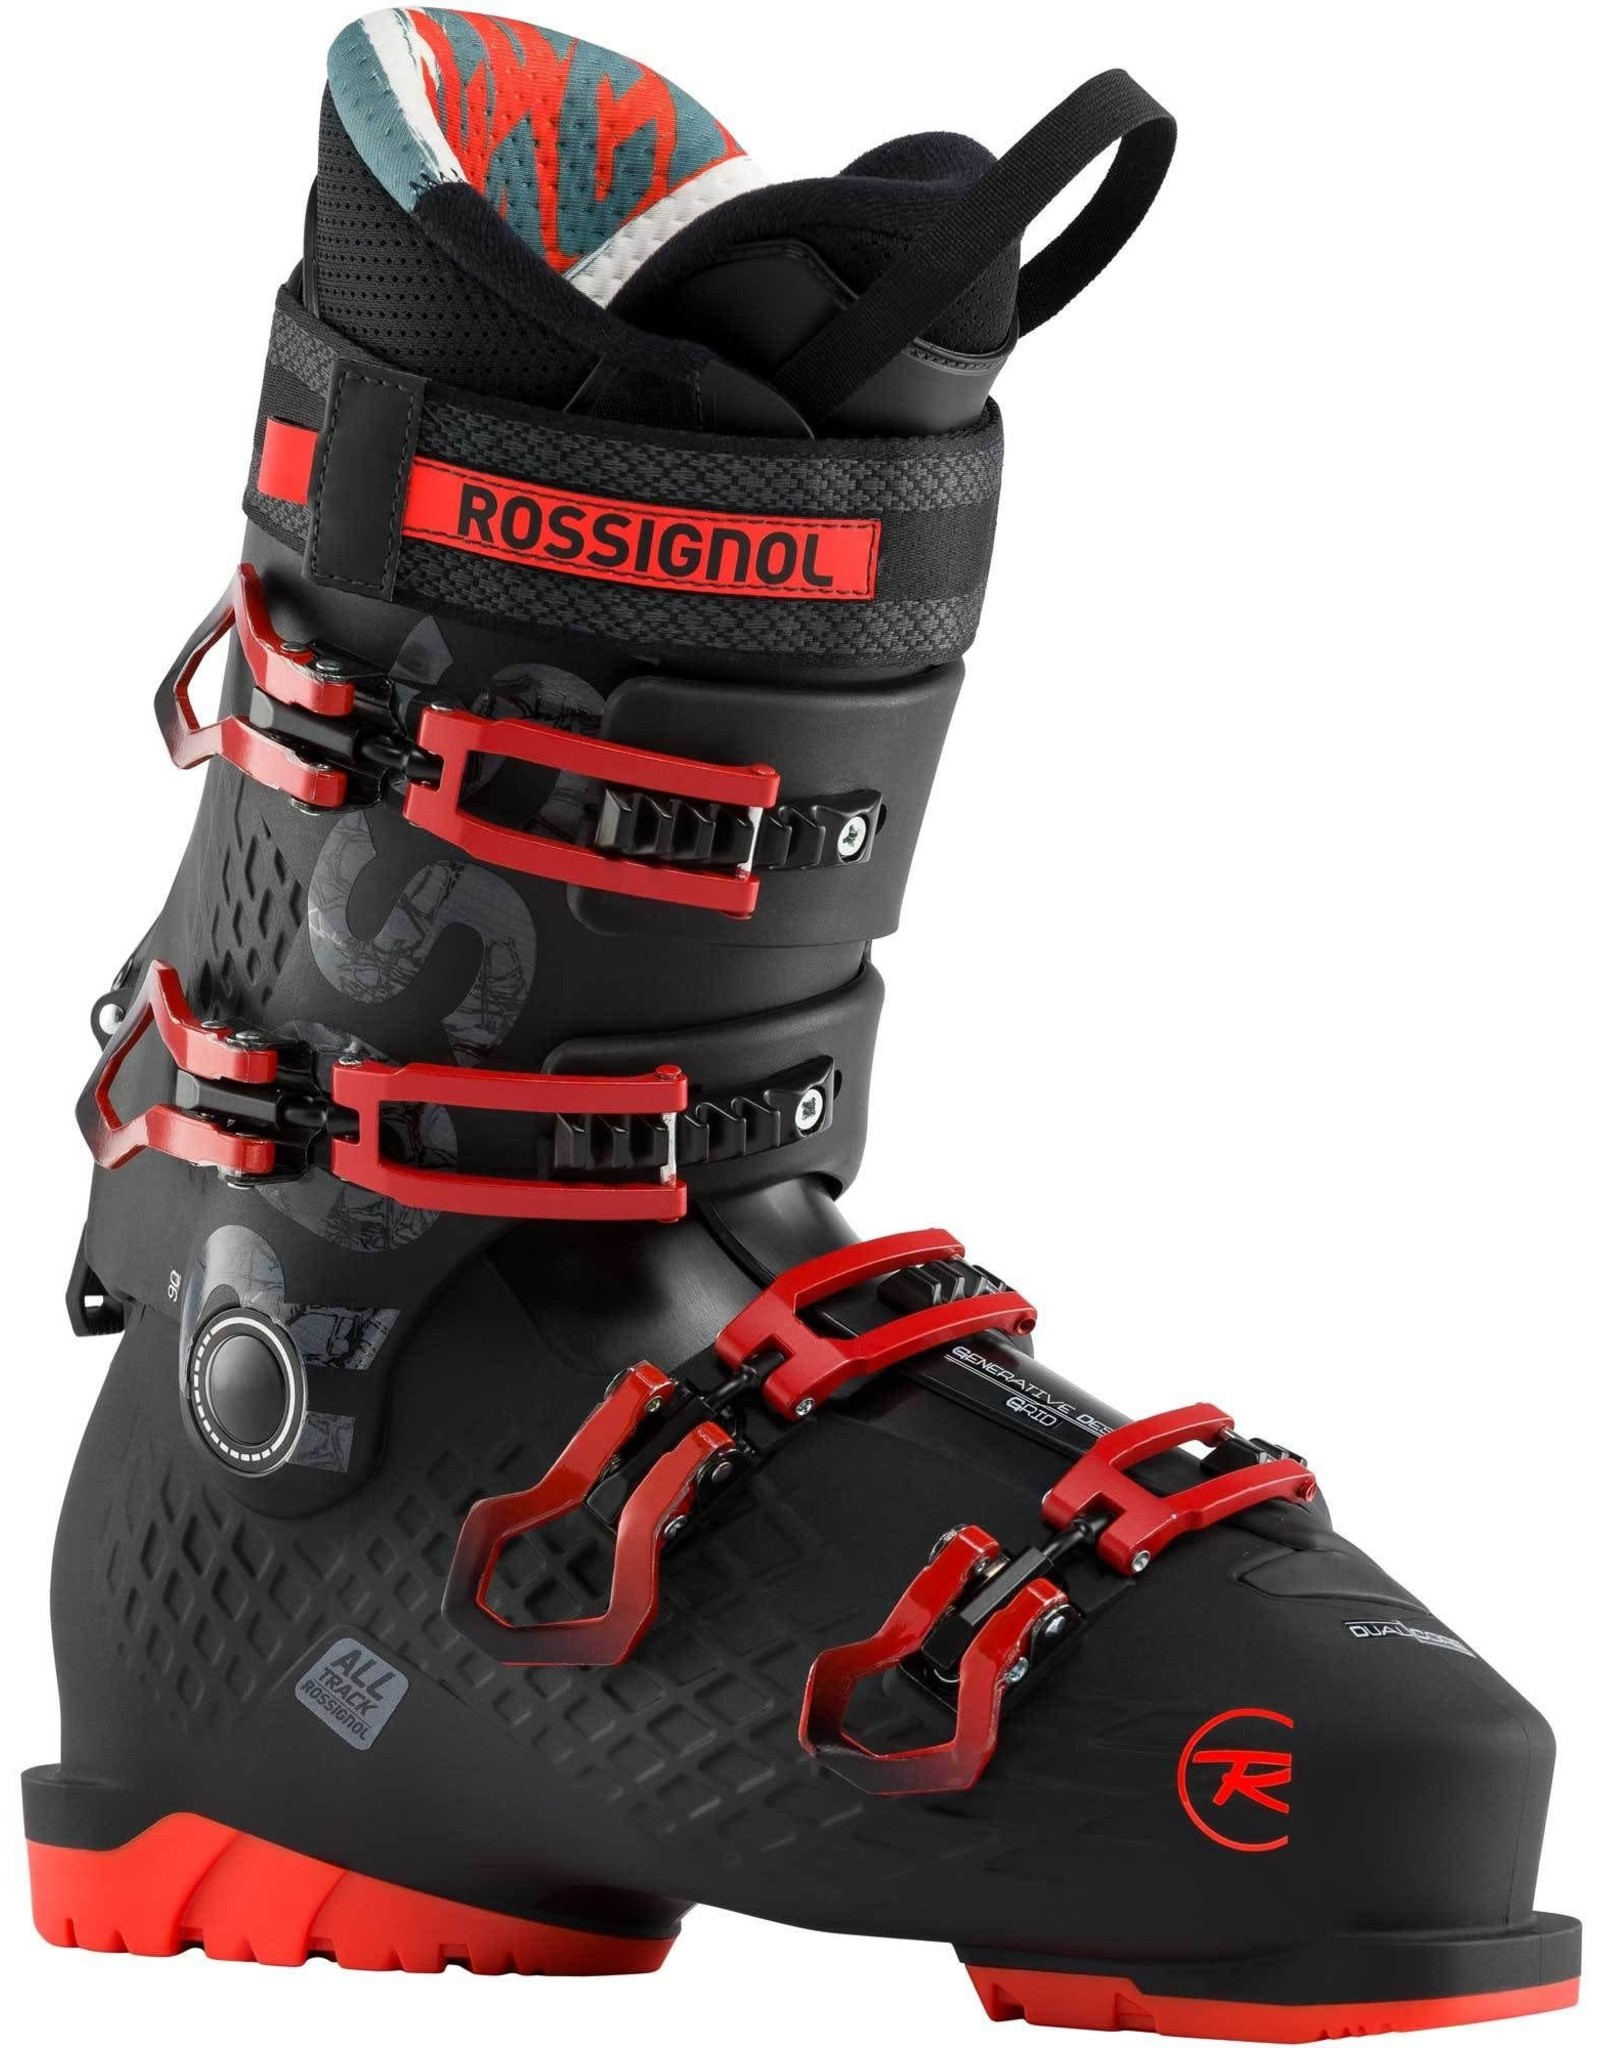 ROSSIGNOL ROSSIGNOL ALLTRACK 90 BLACK/RED BOTTE SKI ALPIN HOMME 20